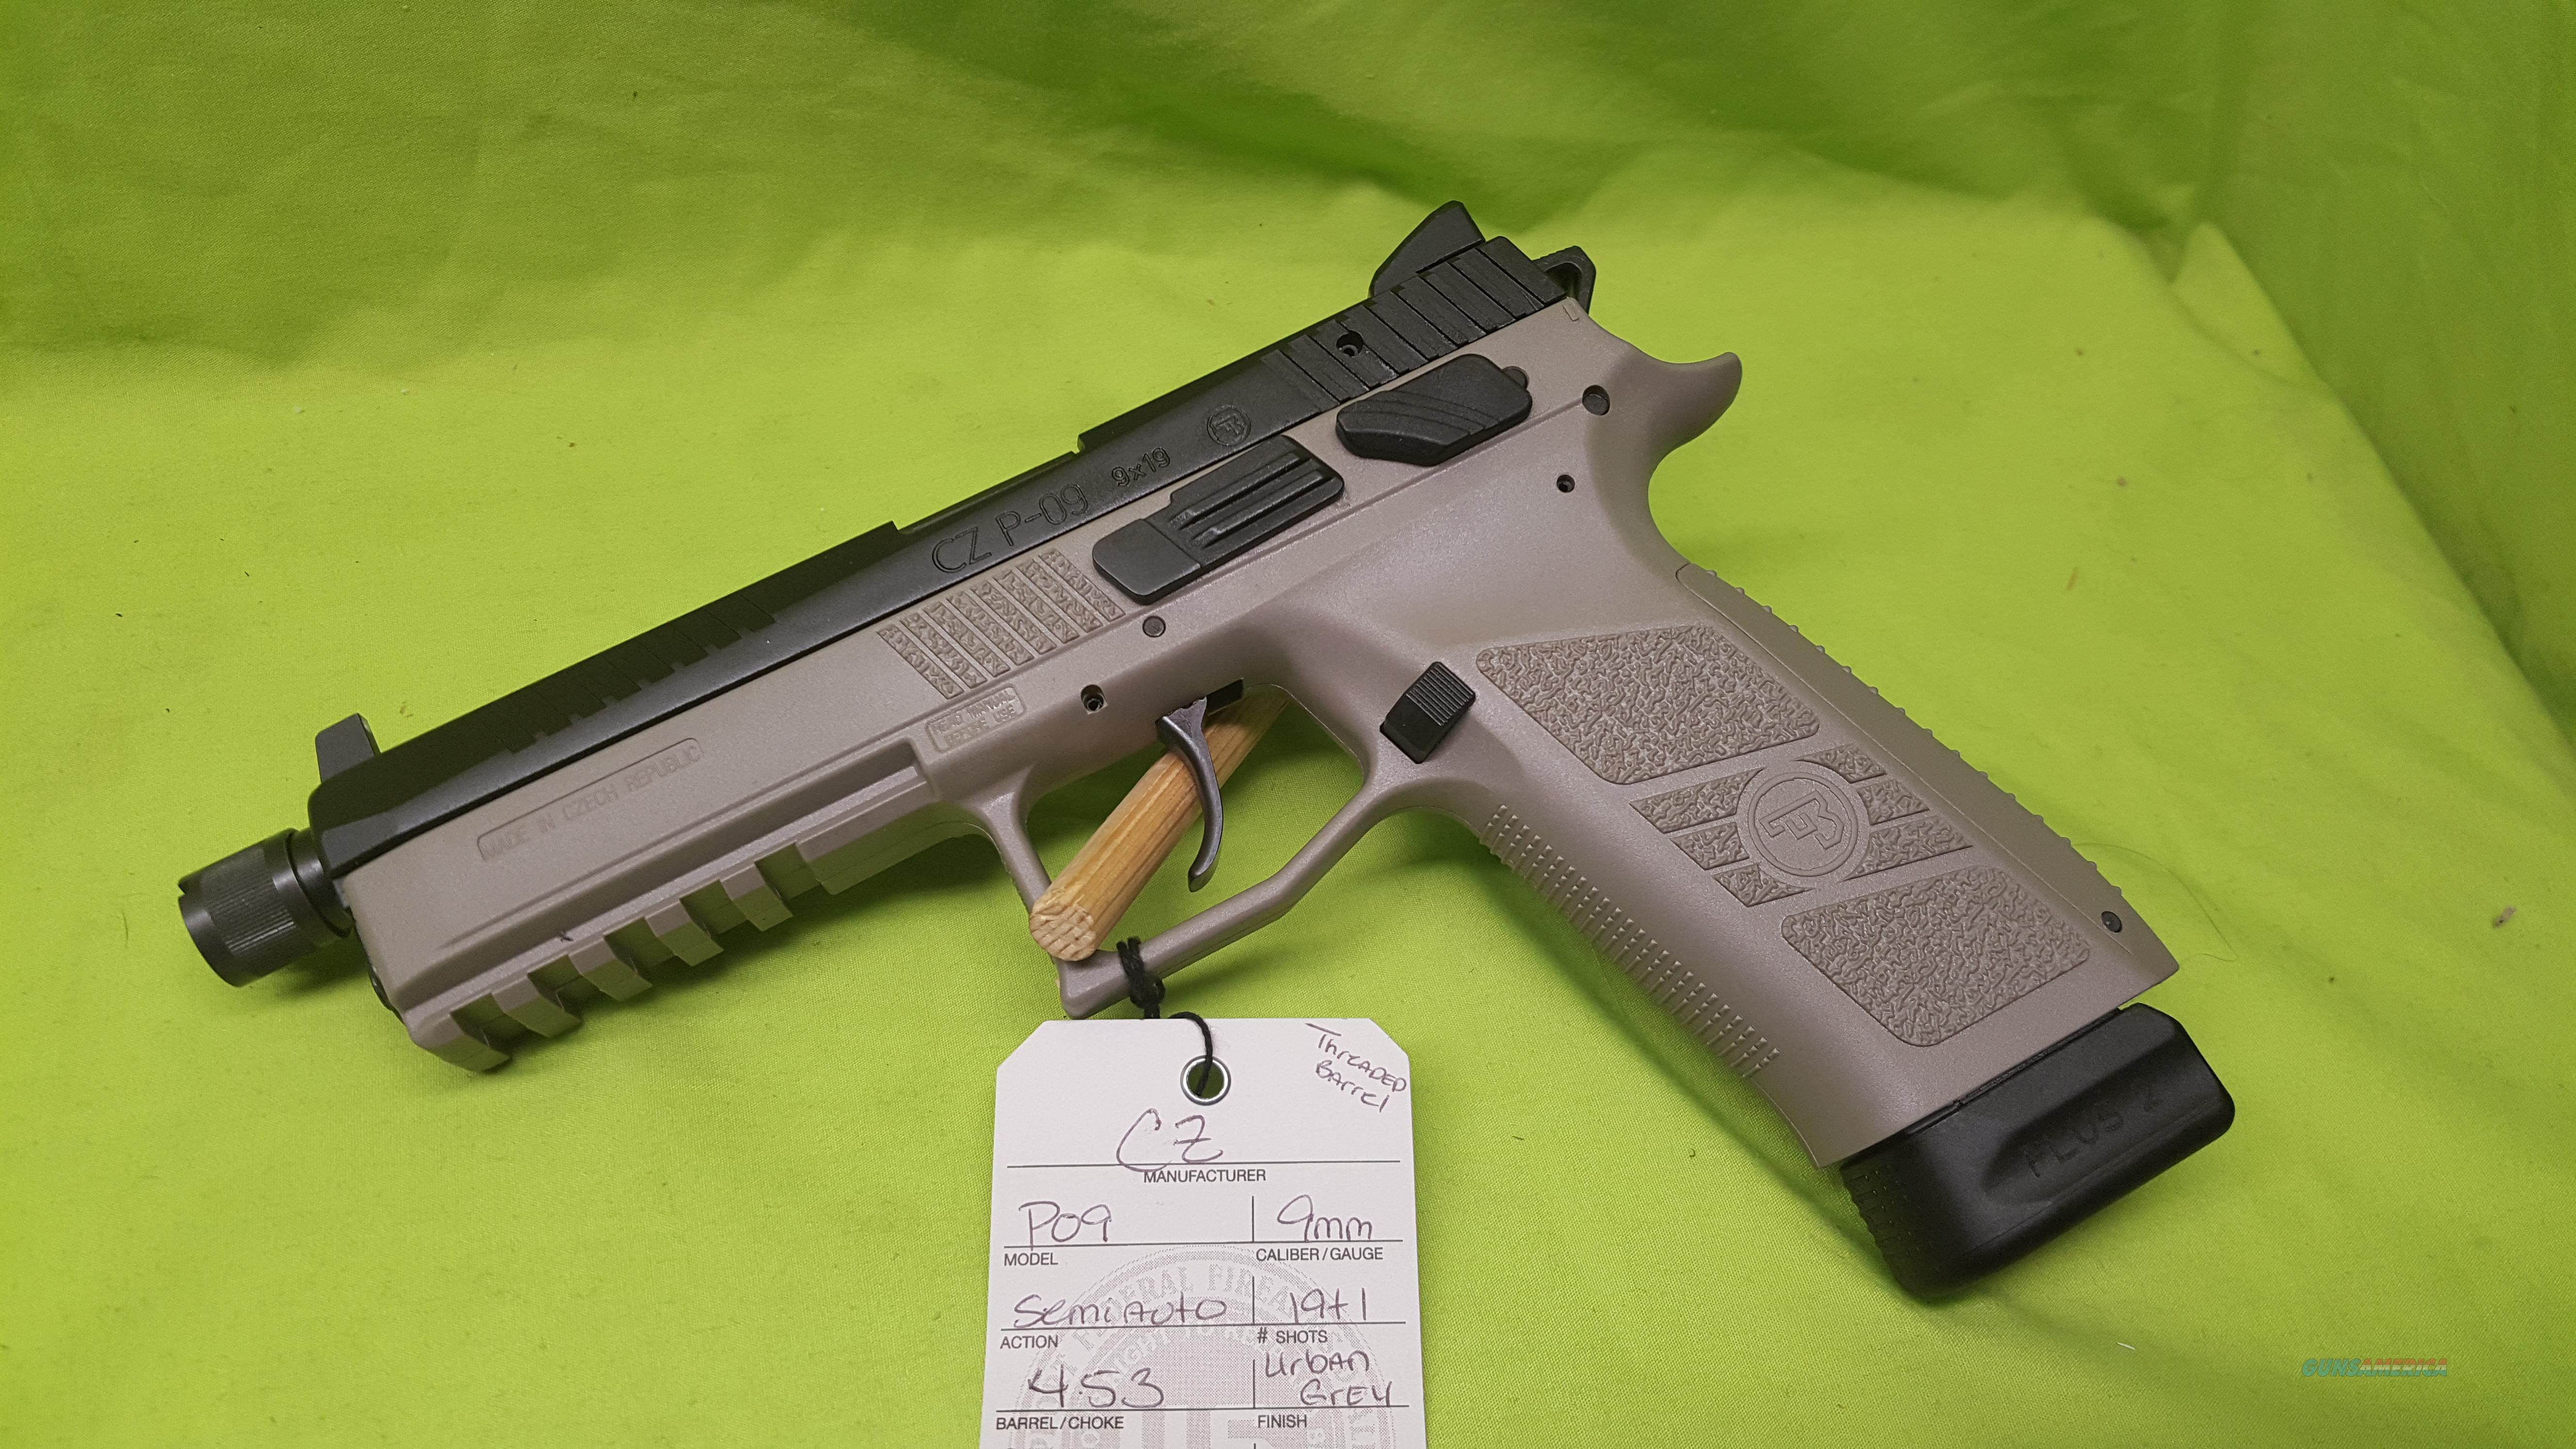 CZ P-09 P09 9 9MM GREY 21+1 THREAD NS 91269  Guns > Pistols > CZ Pistols